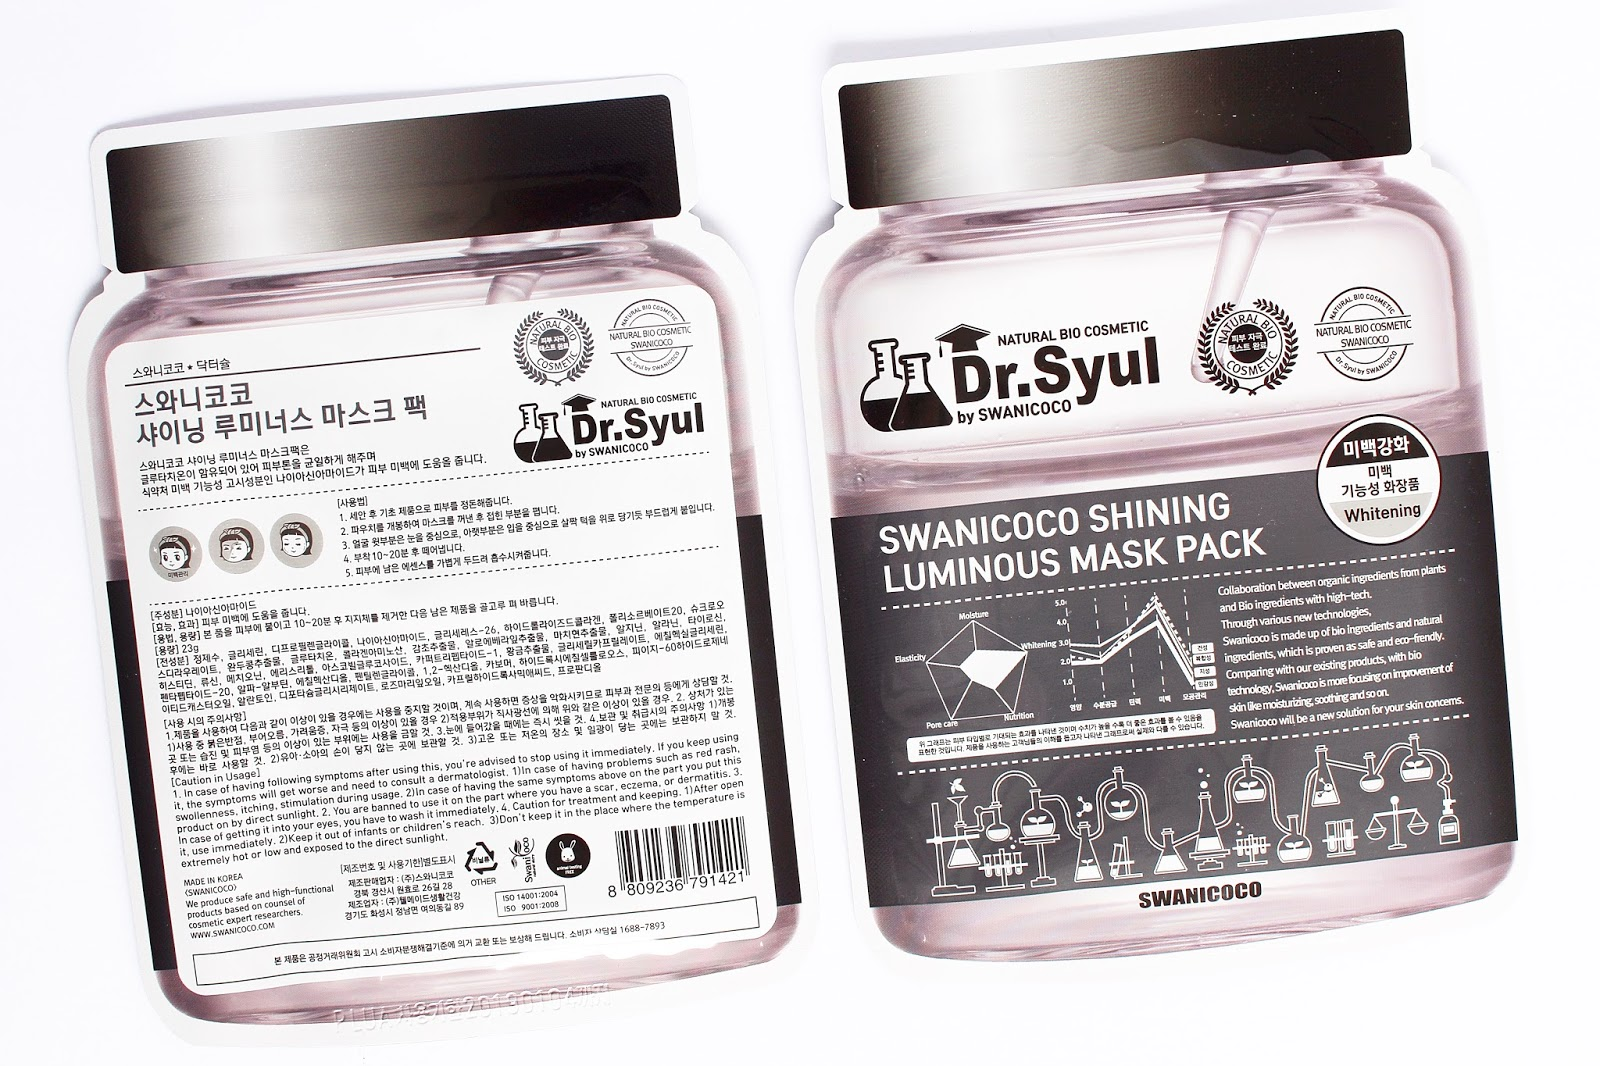 Dr. Syul by Swanicoco, Shining Luminous Mask Pack